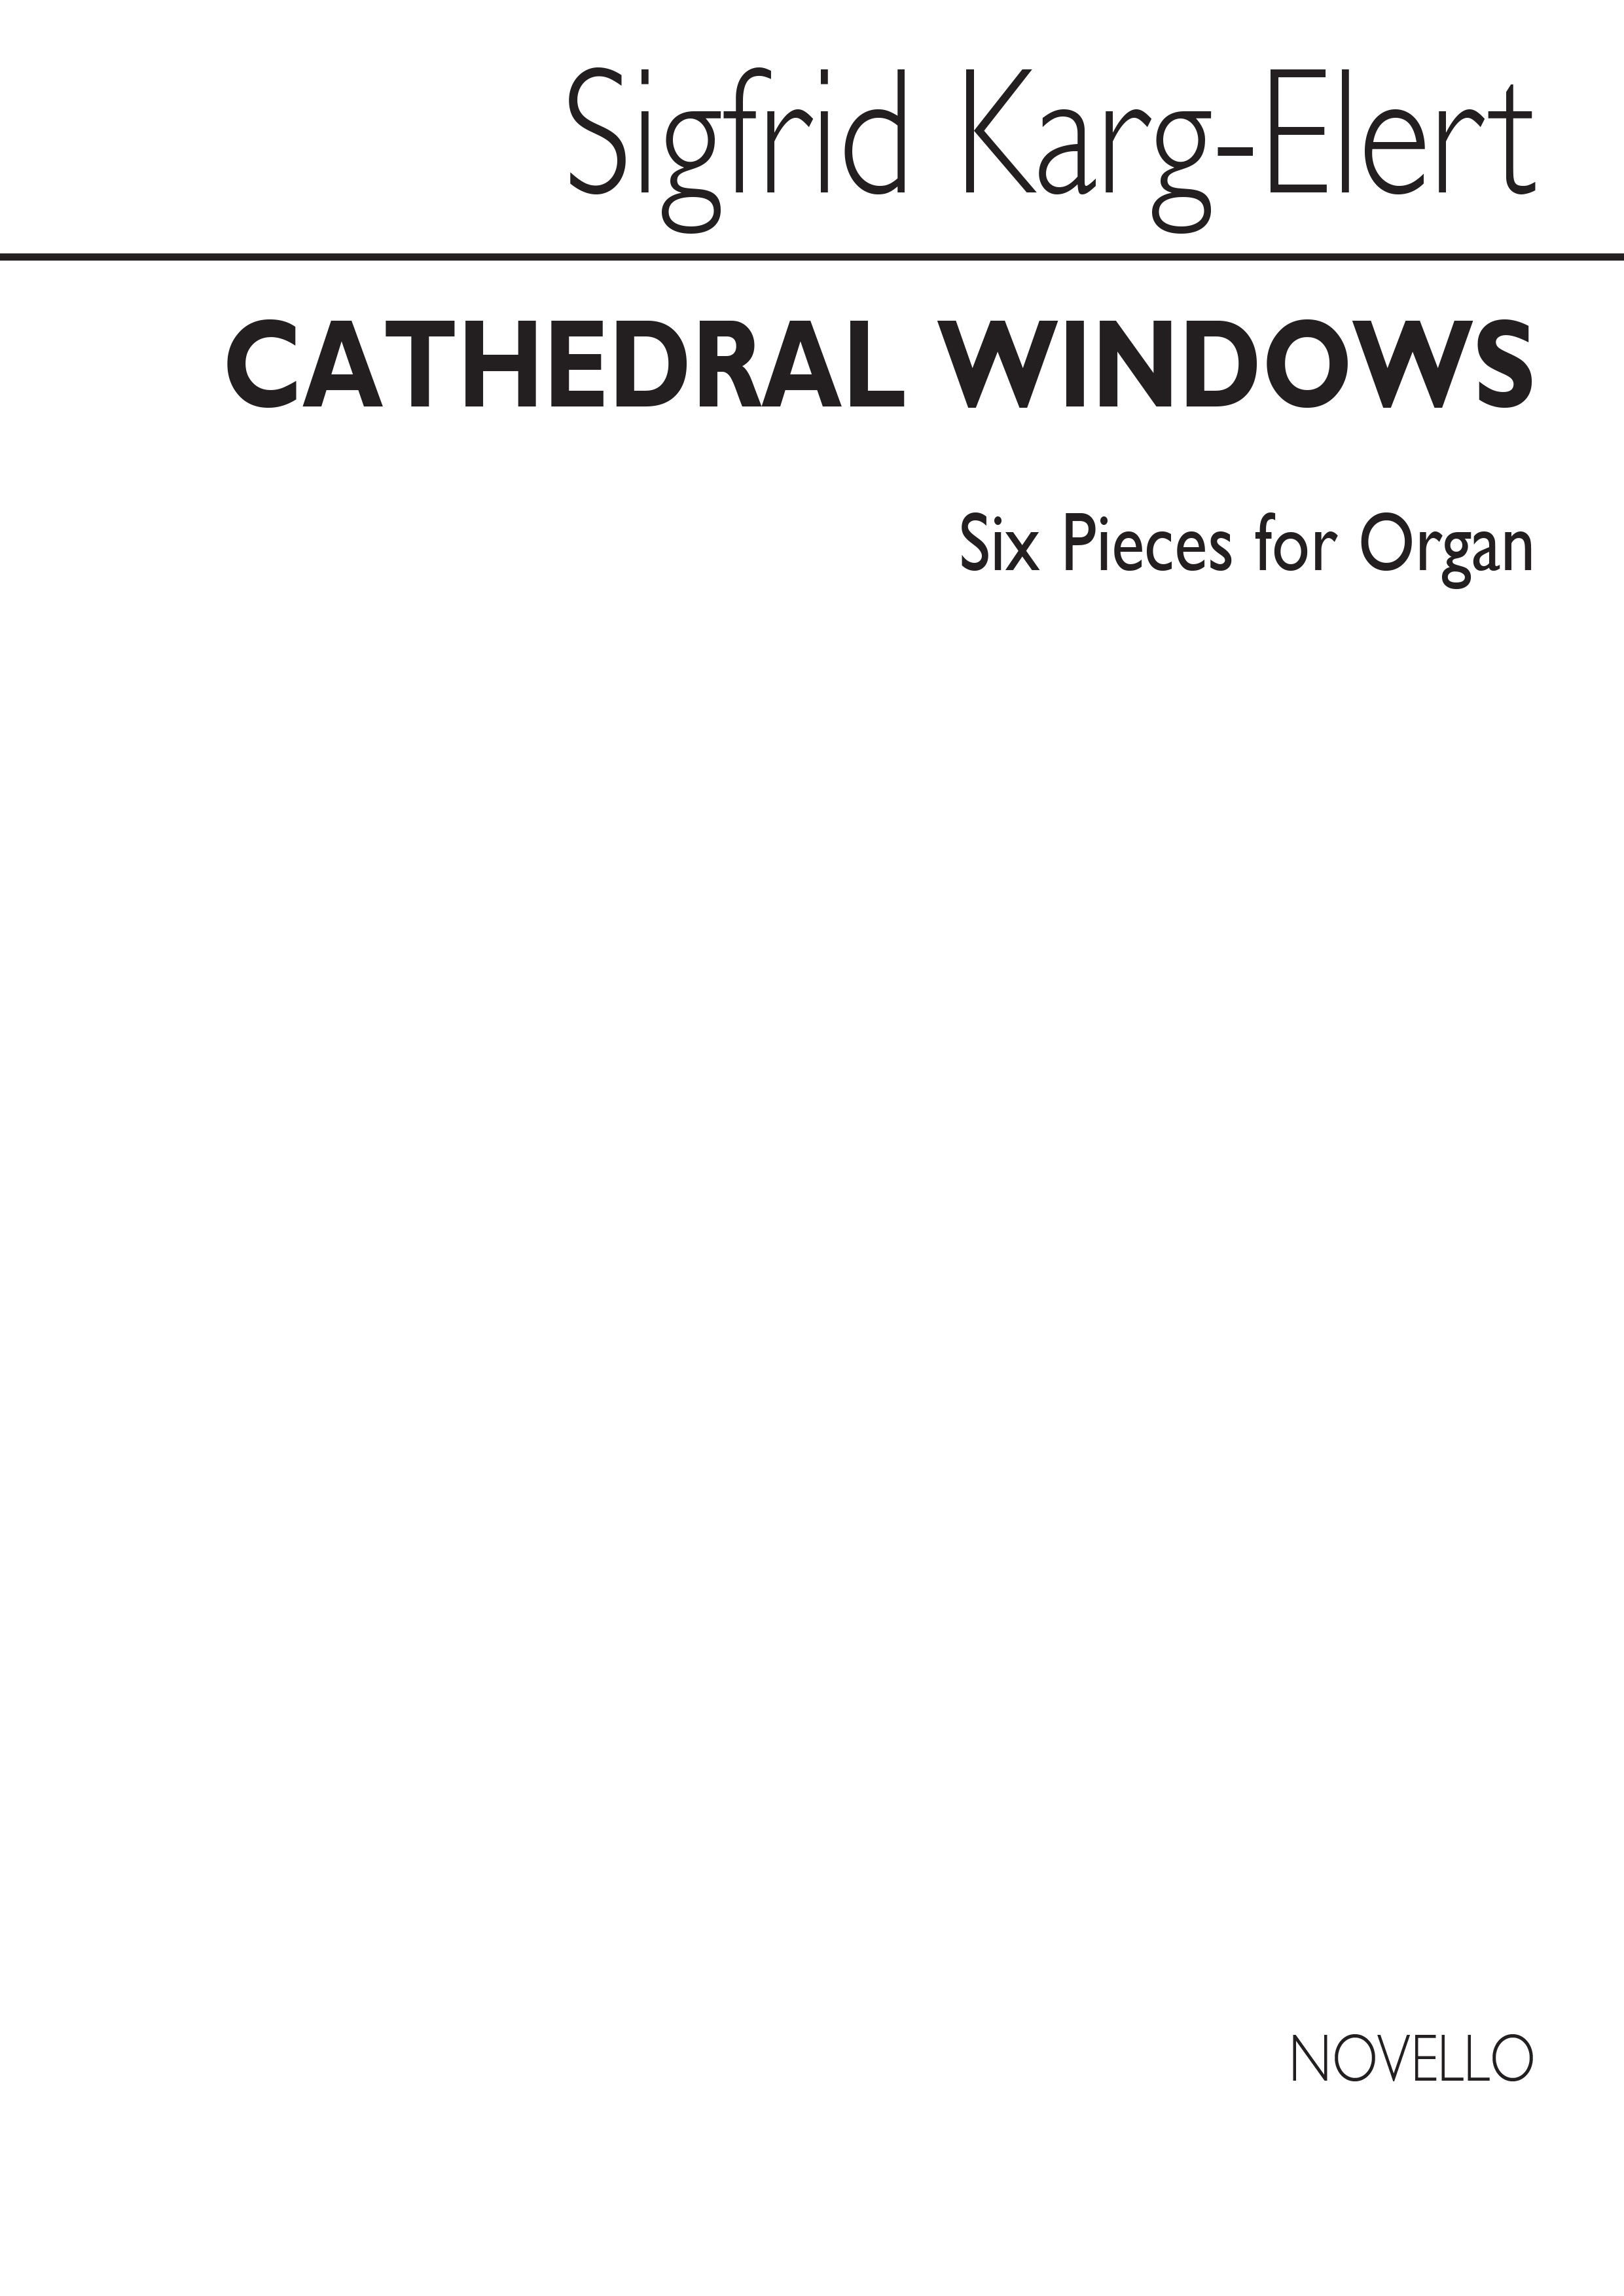 Sigfrid Karg-Elert: Cathedral Windows Op.106: Organ: Instrumental Album